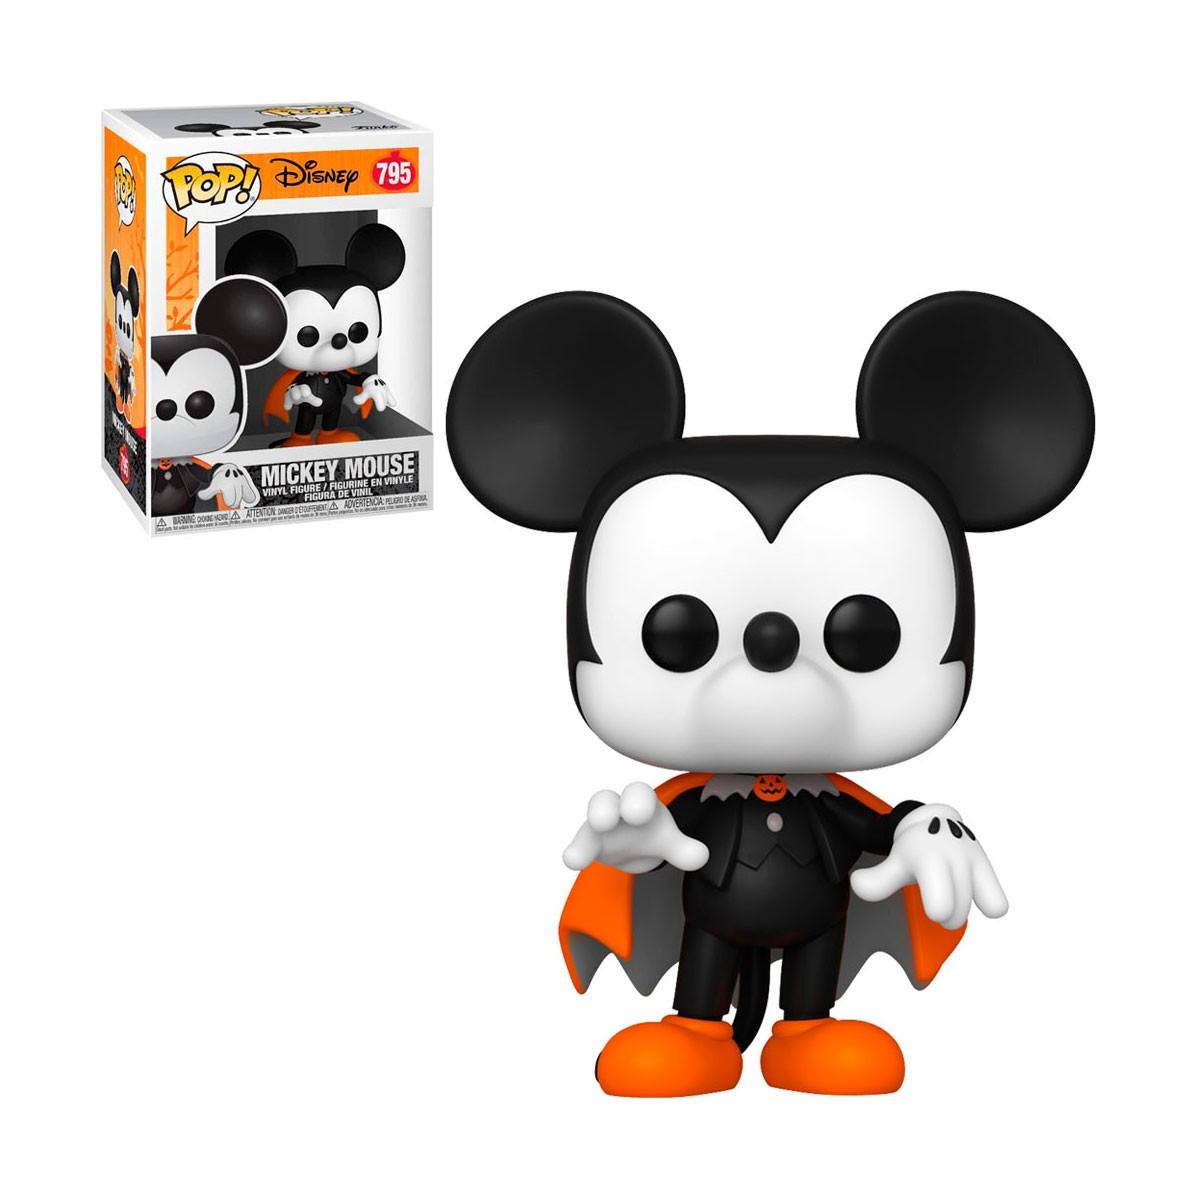 Funko Pop Disney Mickey Mouse 795